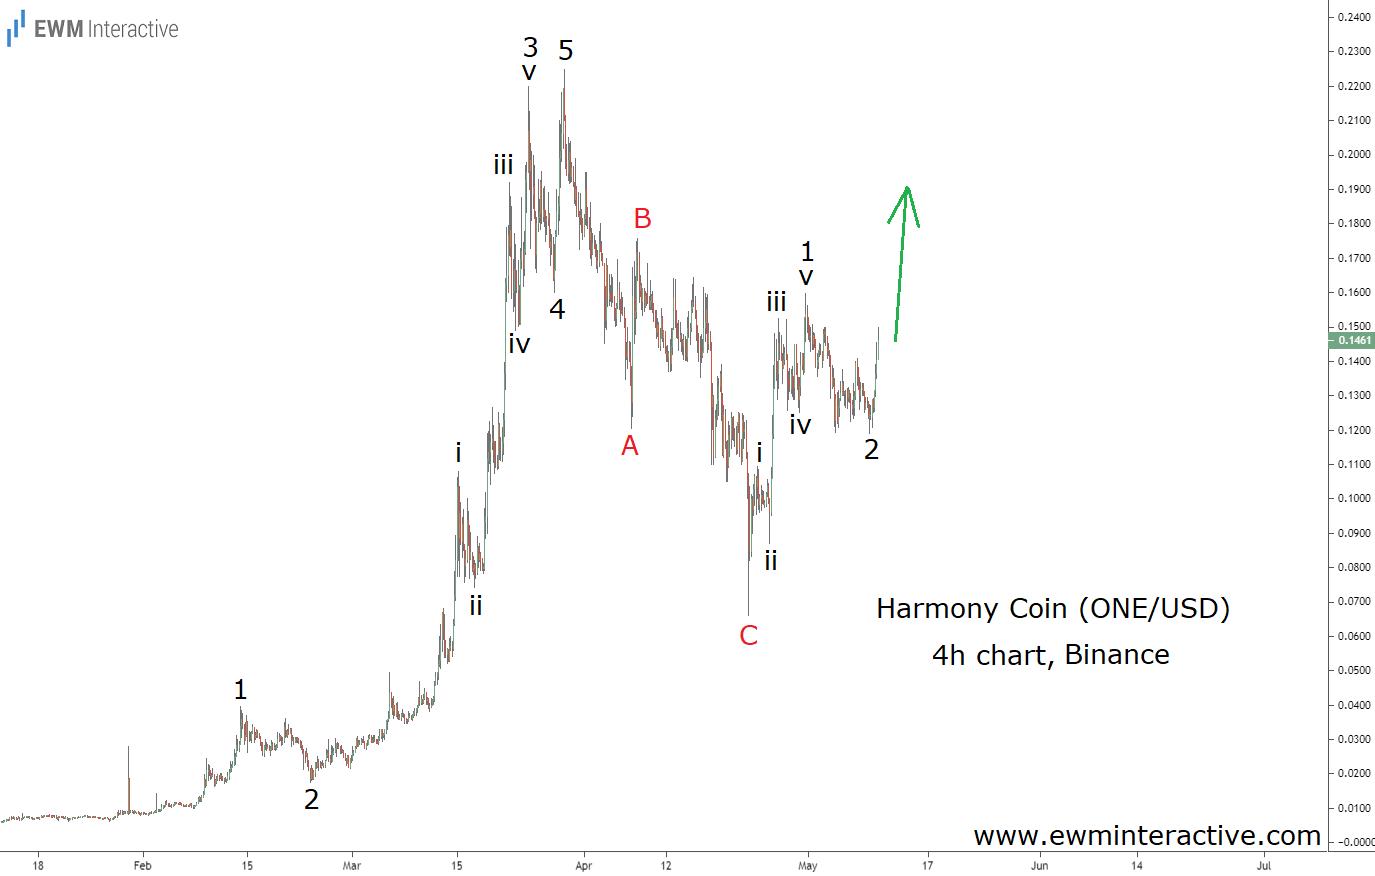 Harmony Crypto Coin Elliott Wave analysis